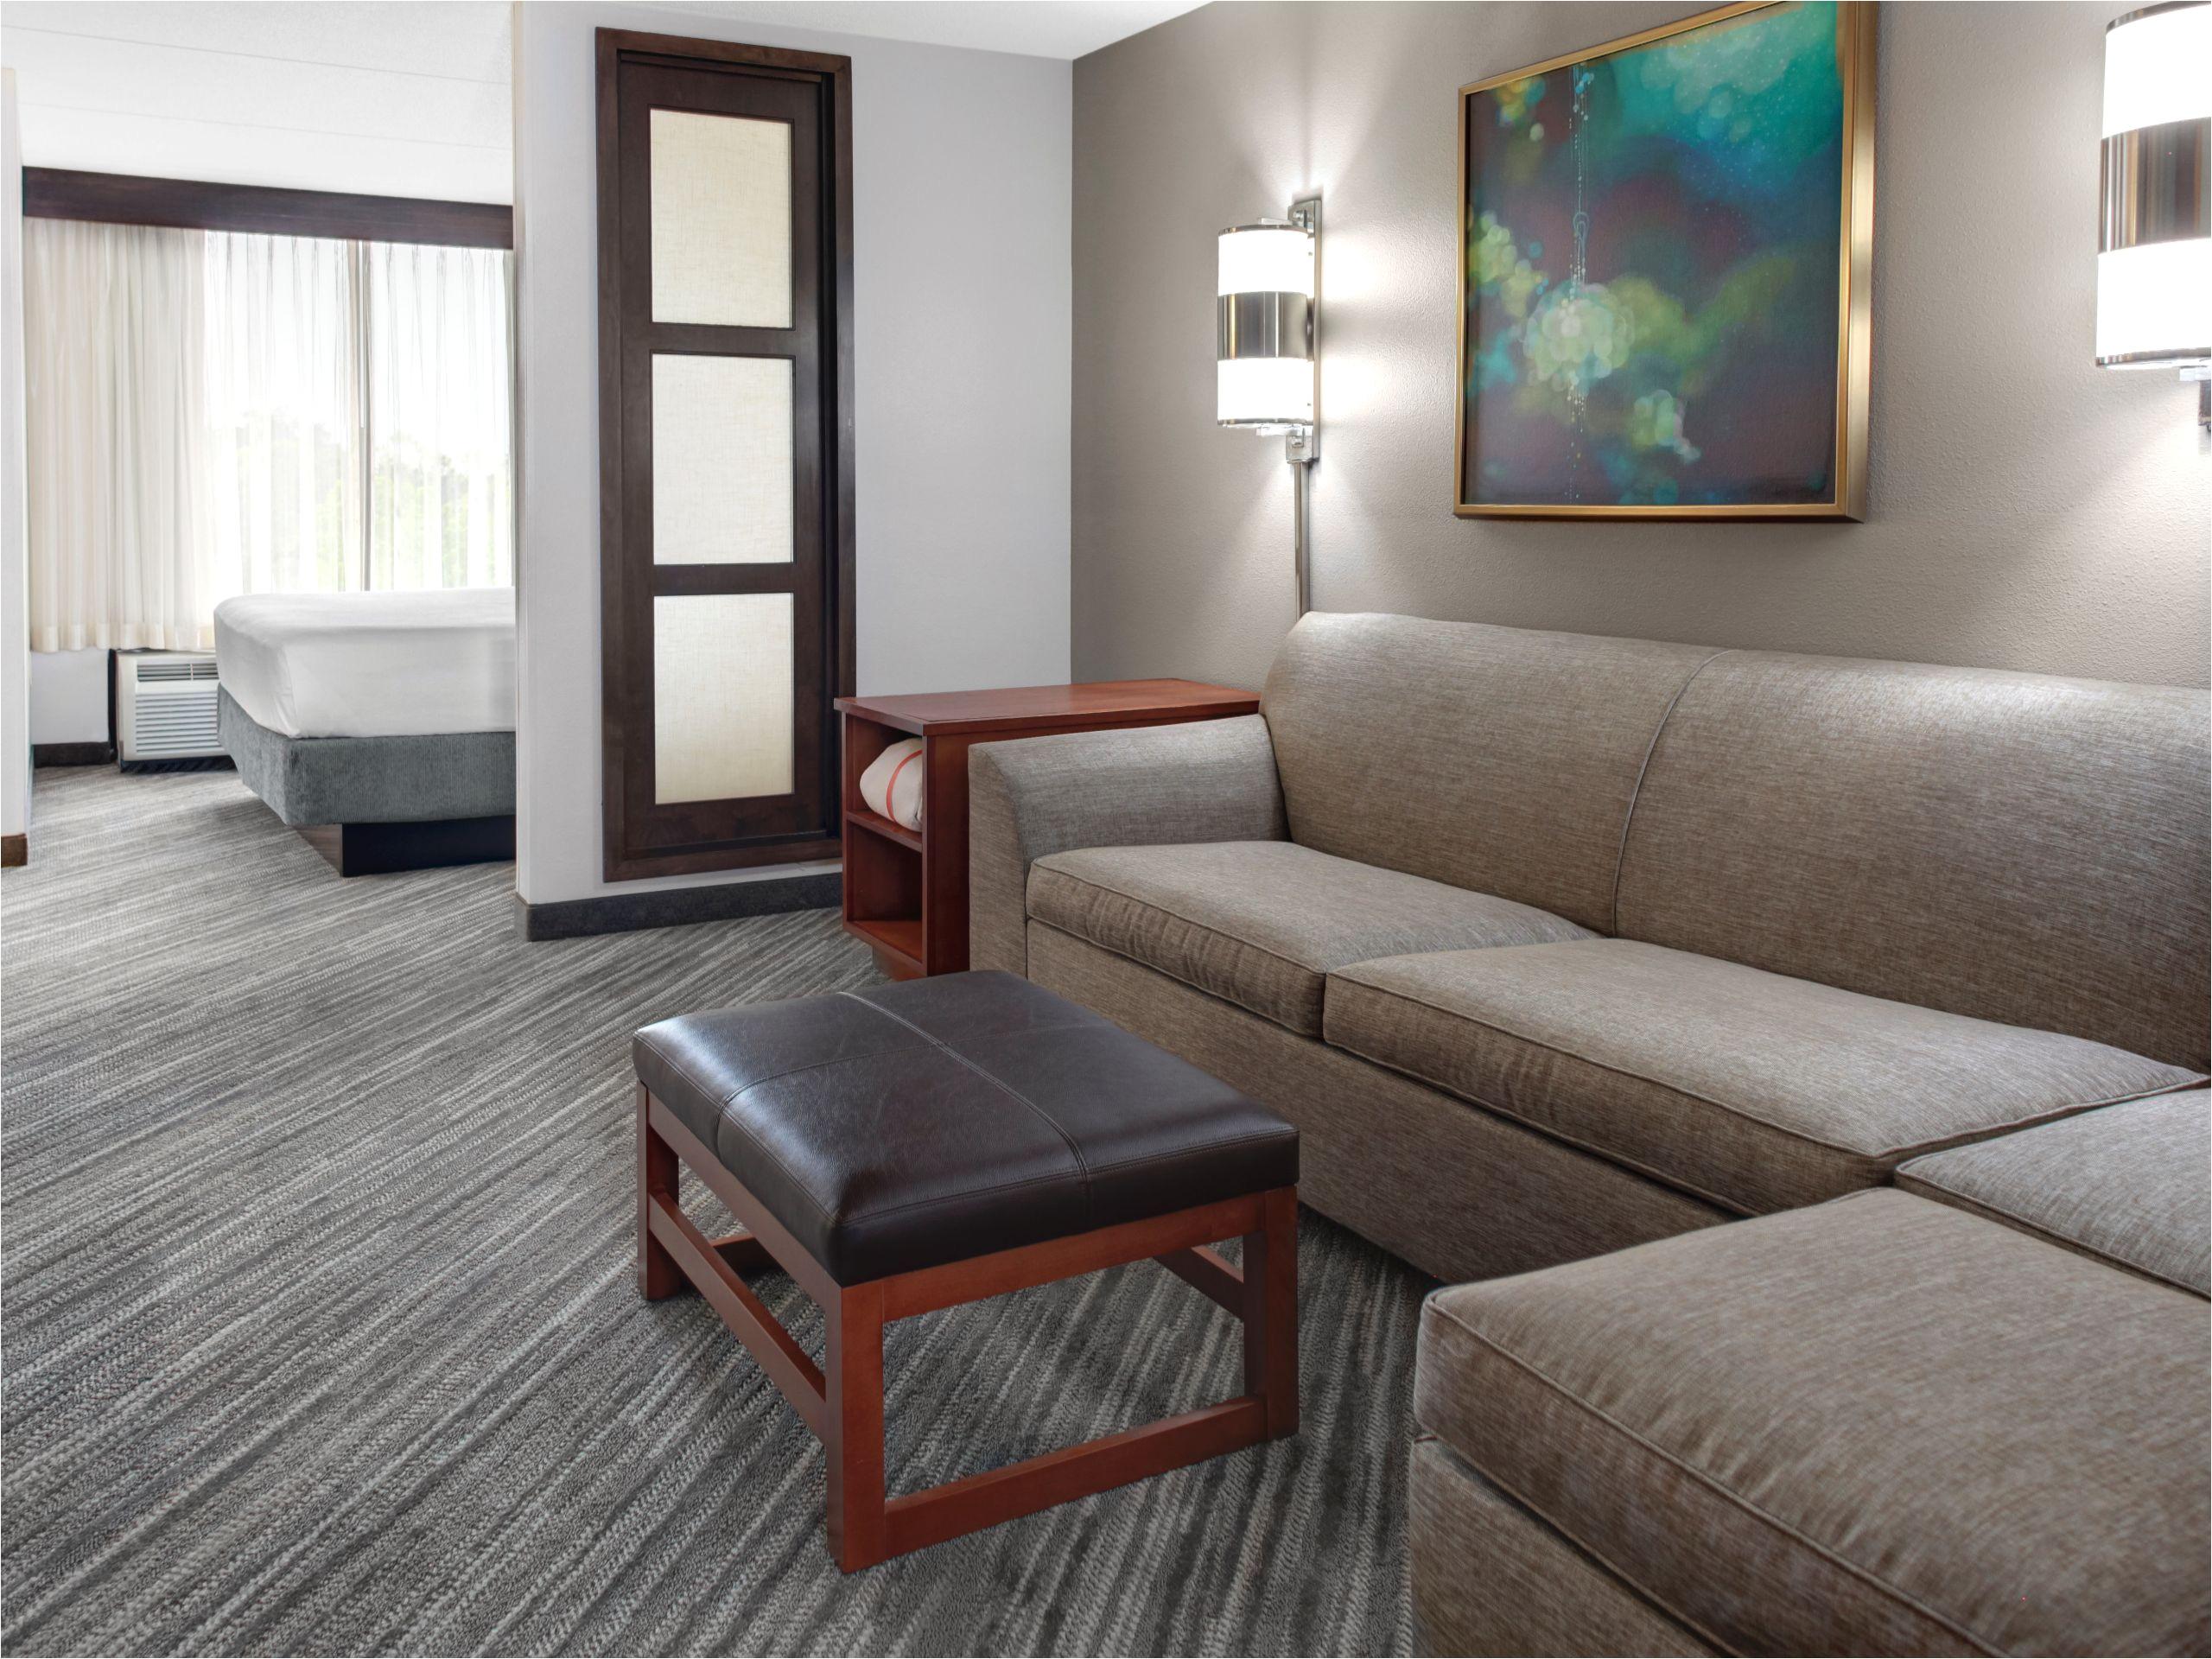 hyatt place chicago itasca p047 guestroom king overall 4x3 jpg